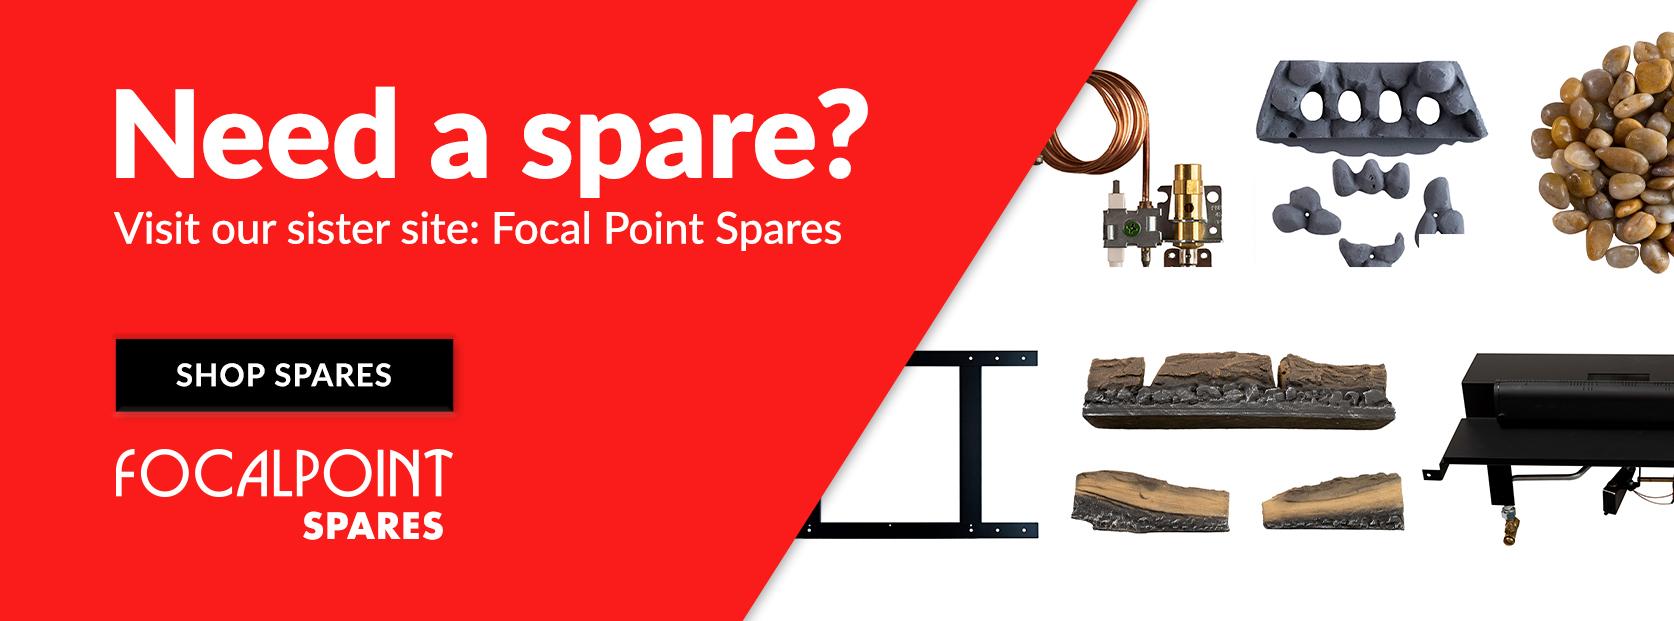 Focal Point Spares Website